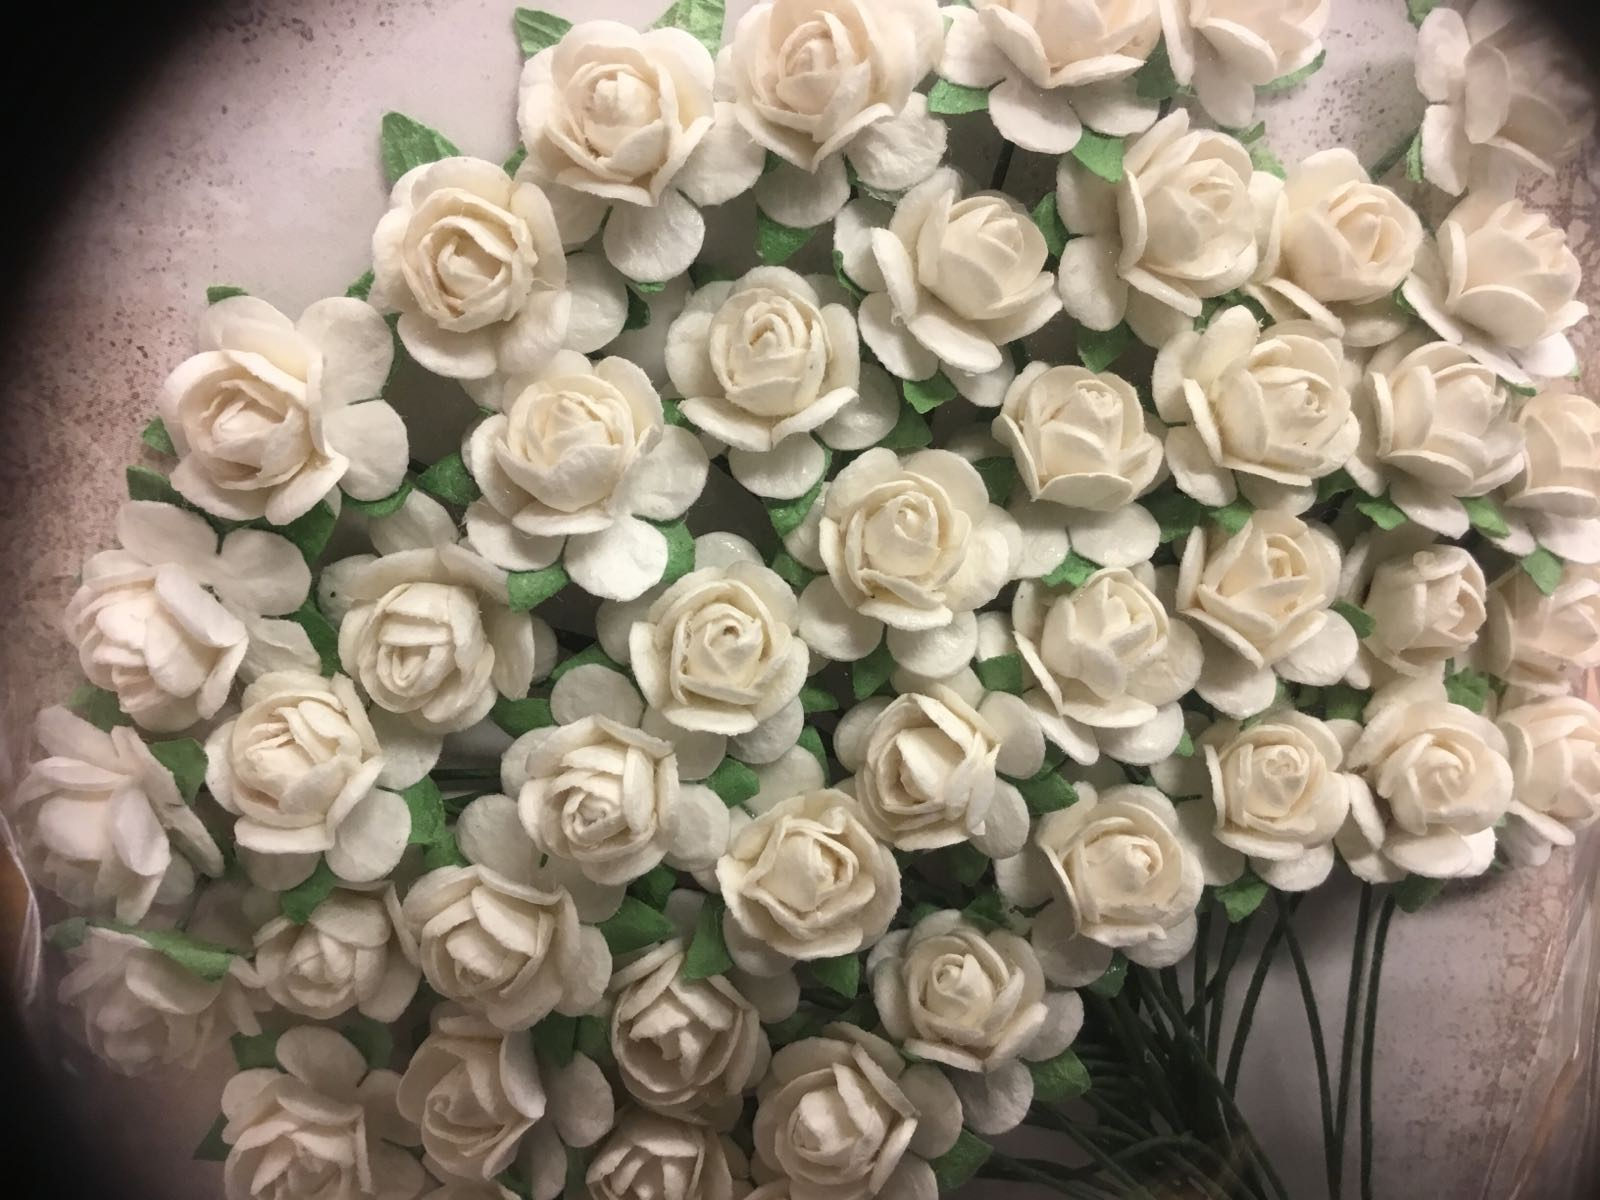 Papirdesign blomster hvit rose, diam ca 1cm